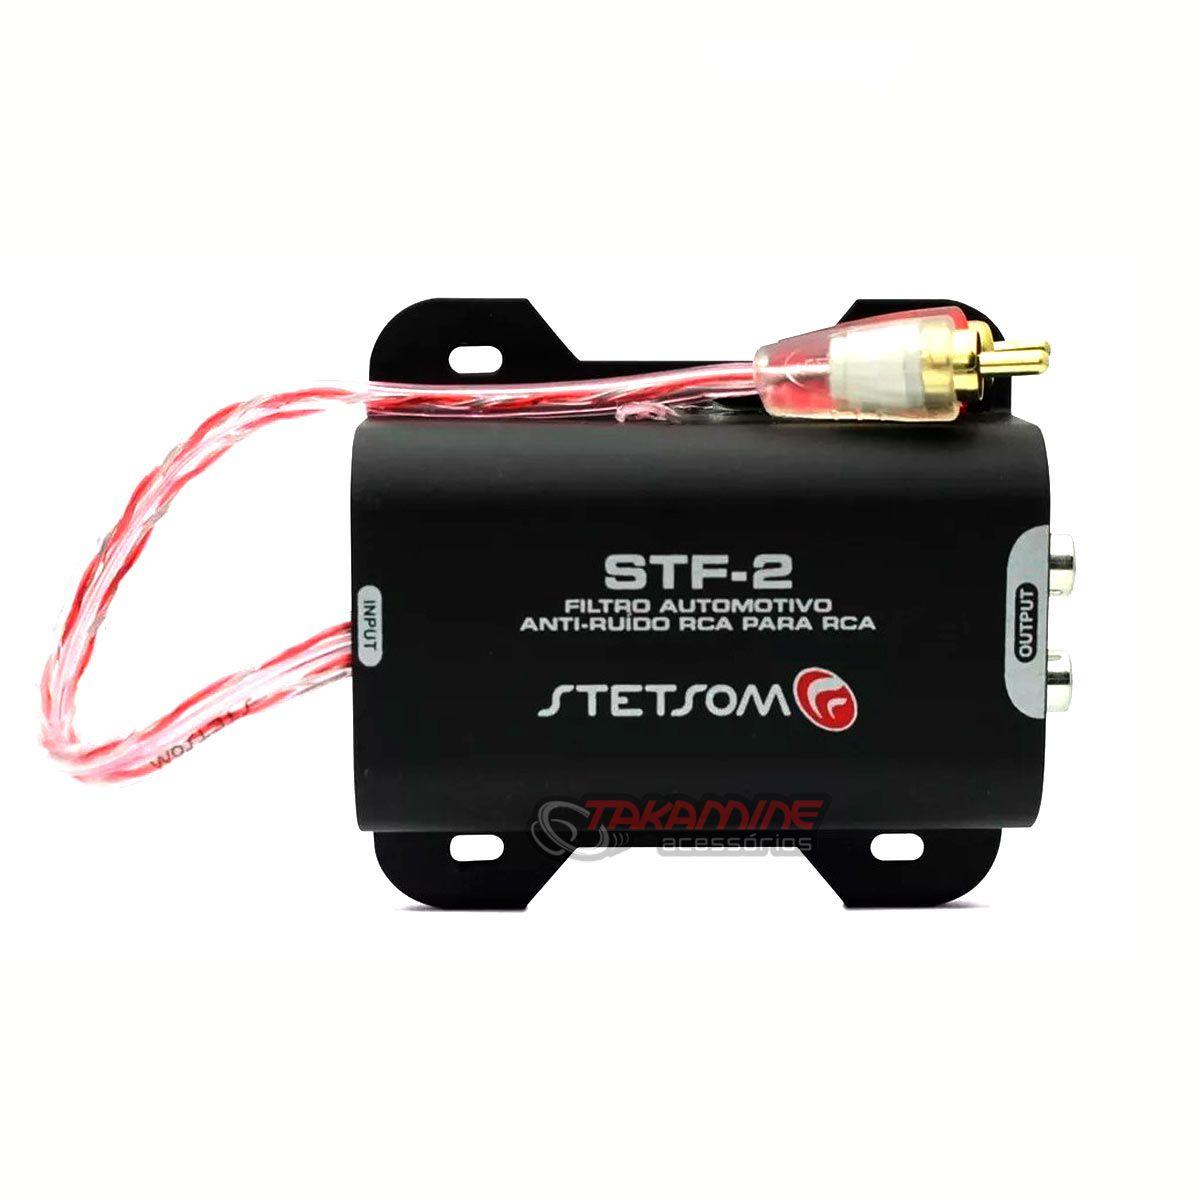 Filtro anti-ruído Stetsom STF-2 supressor RCA para som automotivo